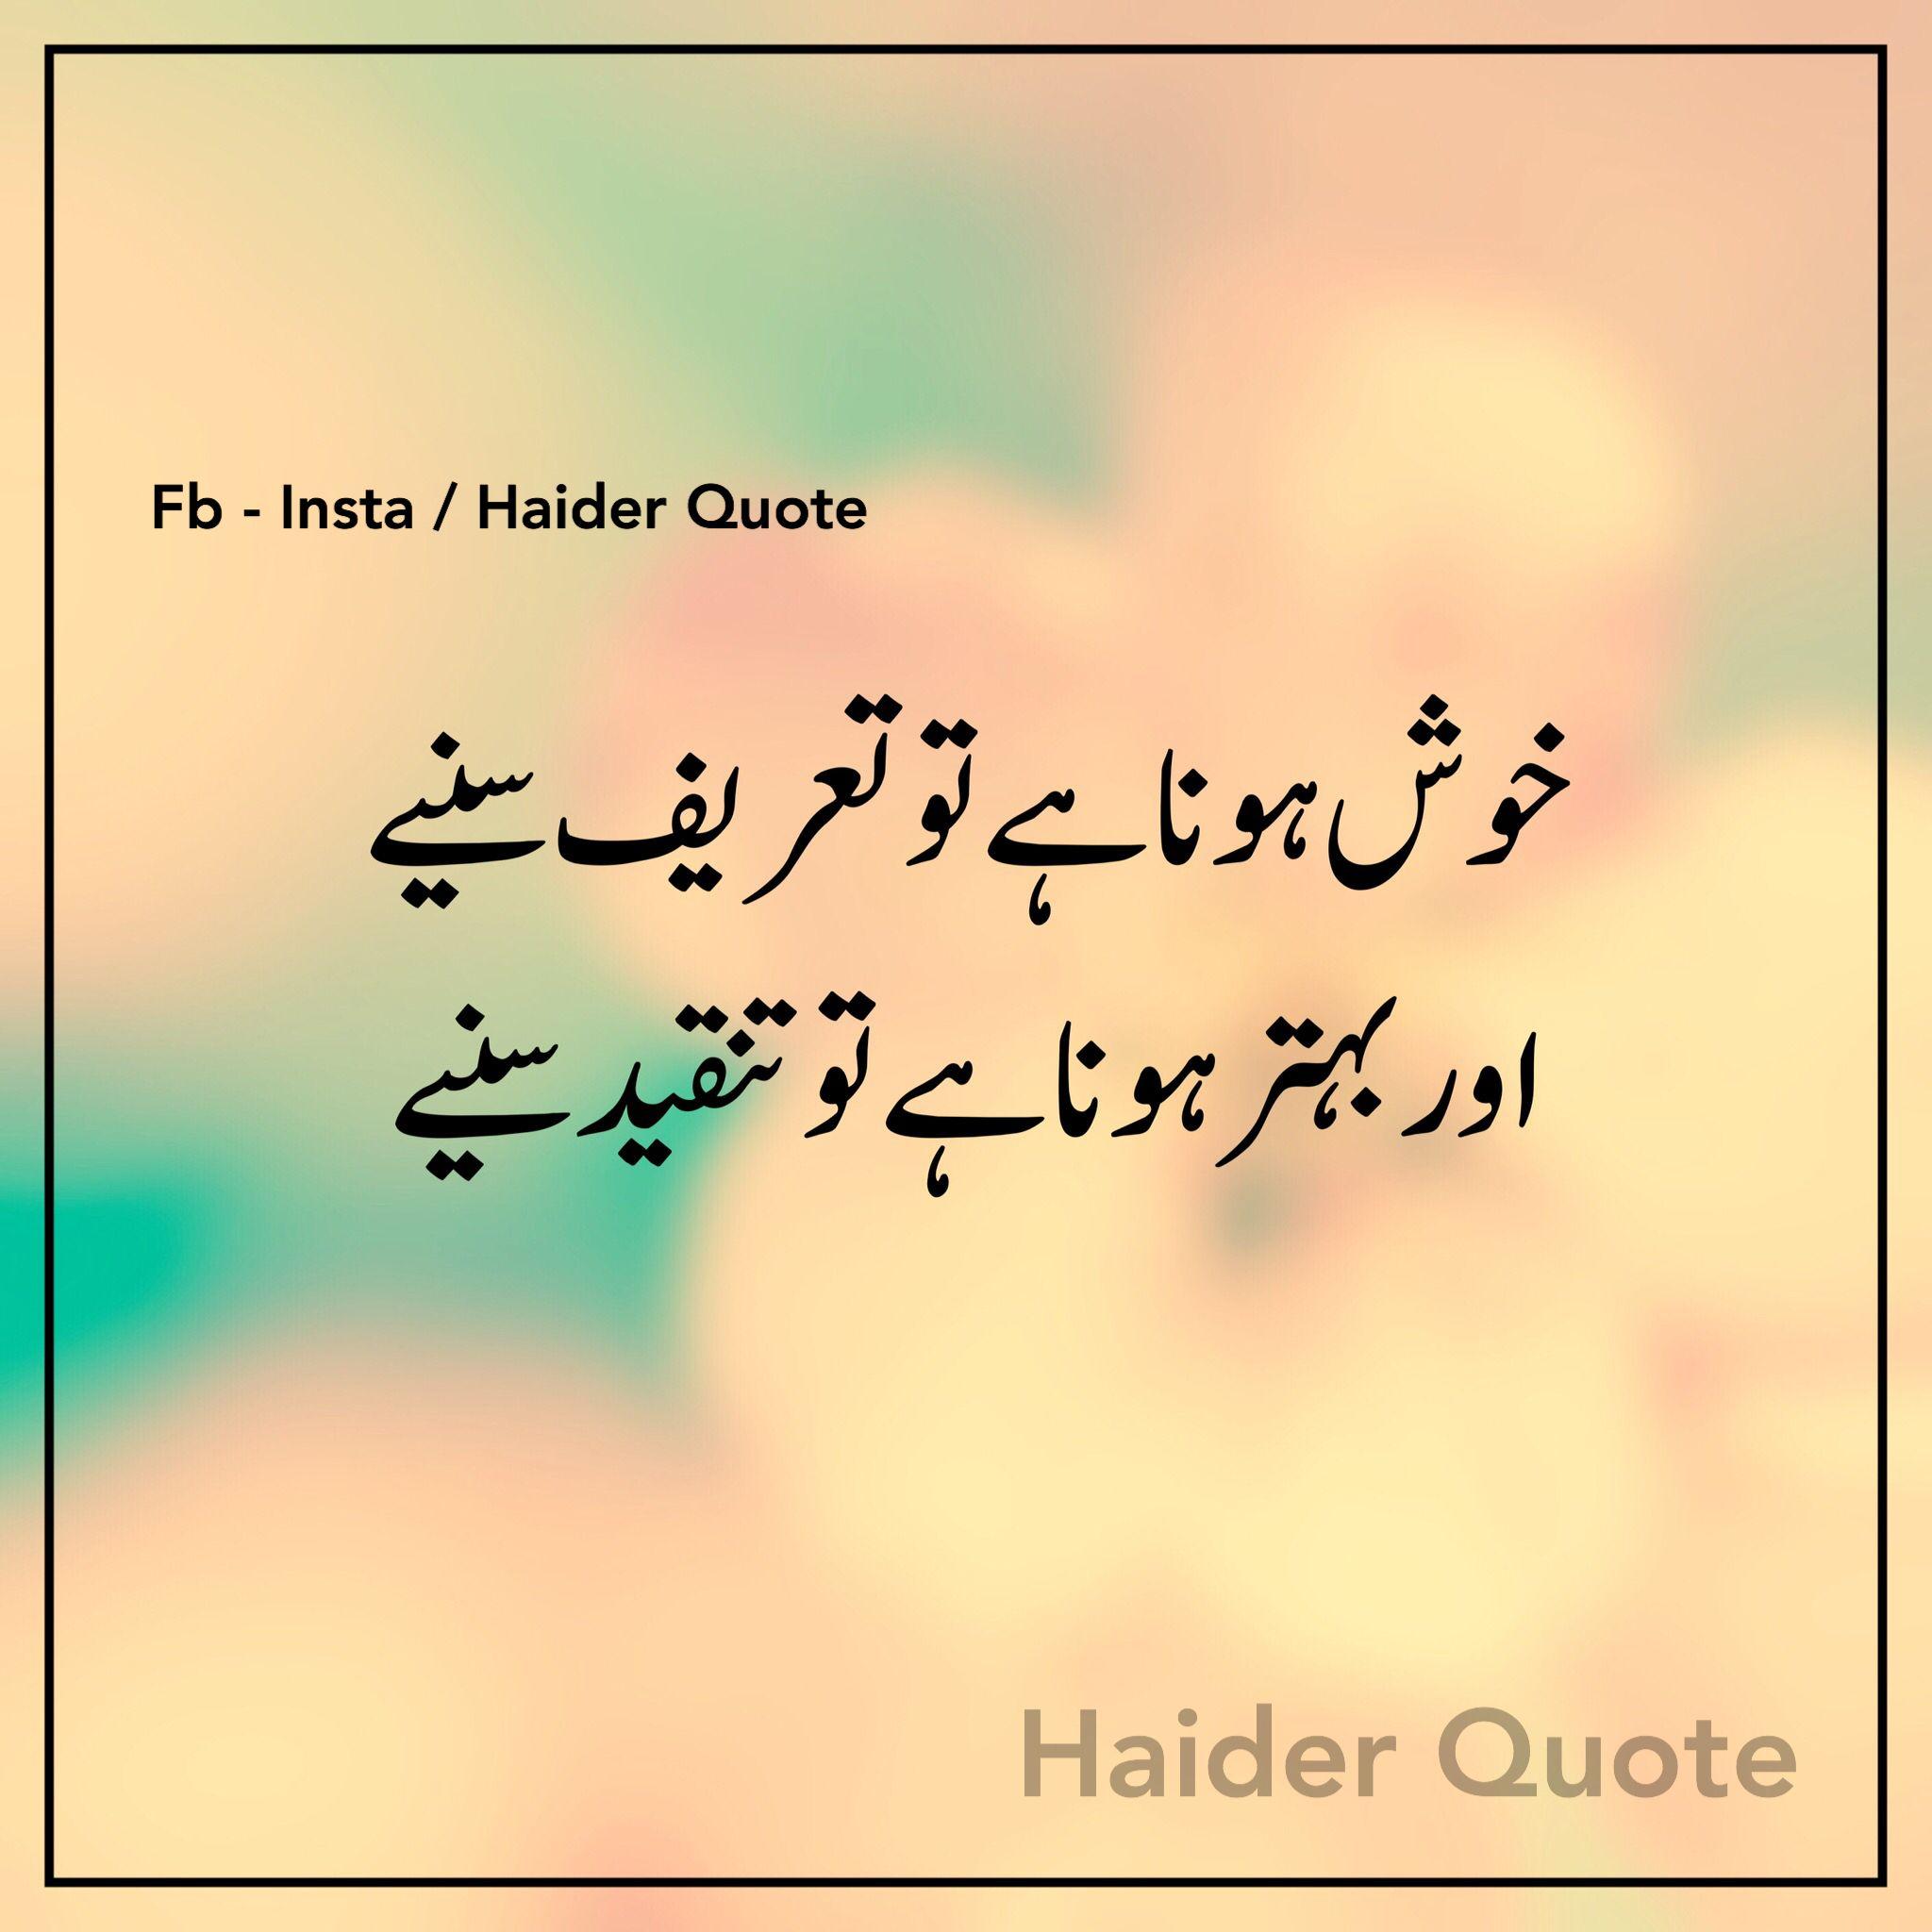 Allah Ki Rah Quotes Haider Quote Urdu Poetry Urdu Quotes Saheli Quotes Shaur Quotes Quotes Movie Posters Movies